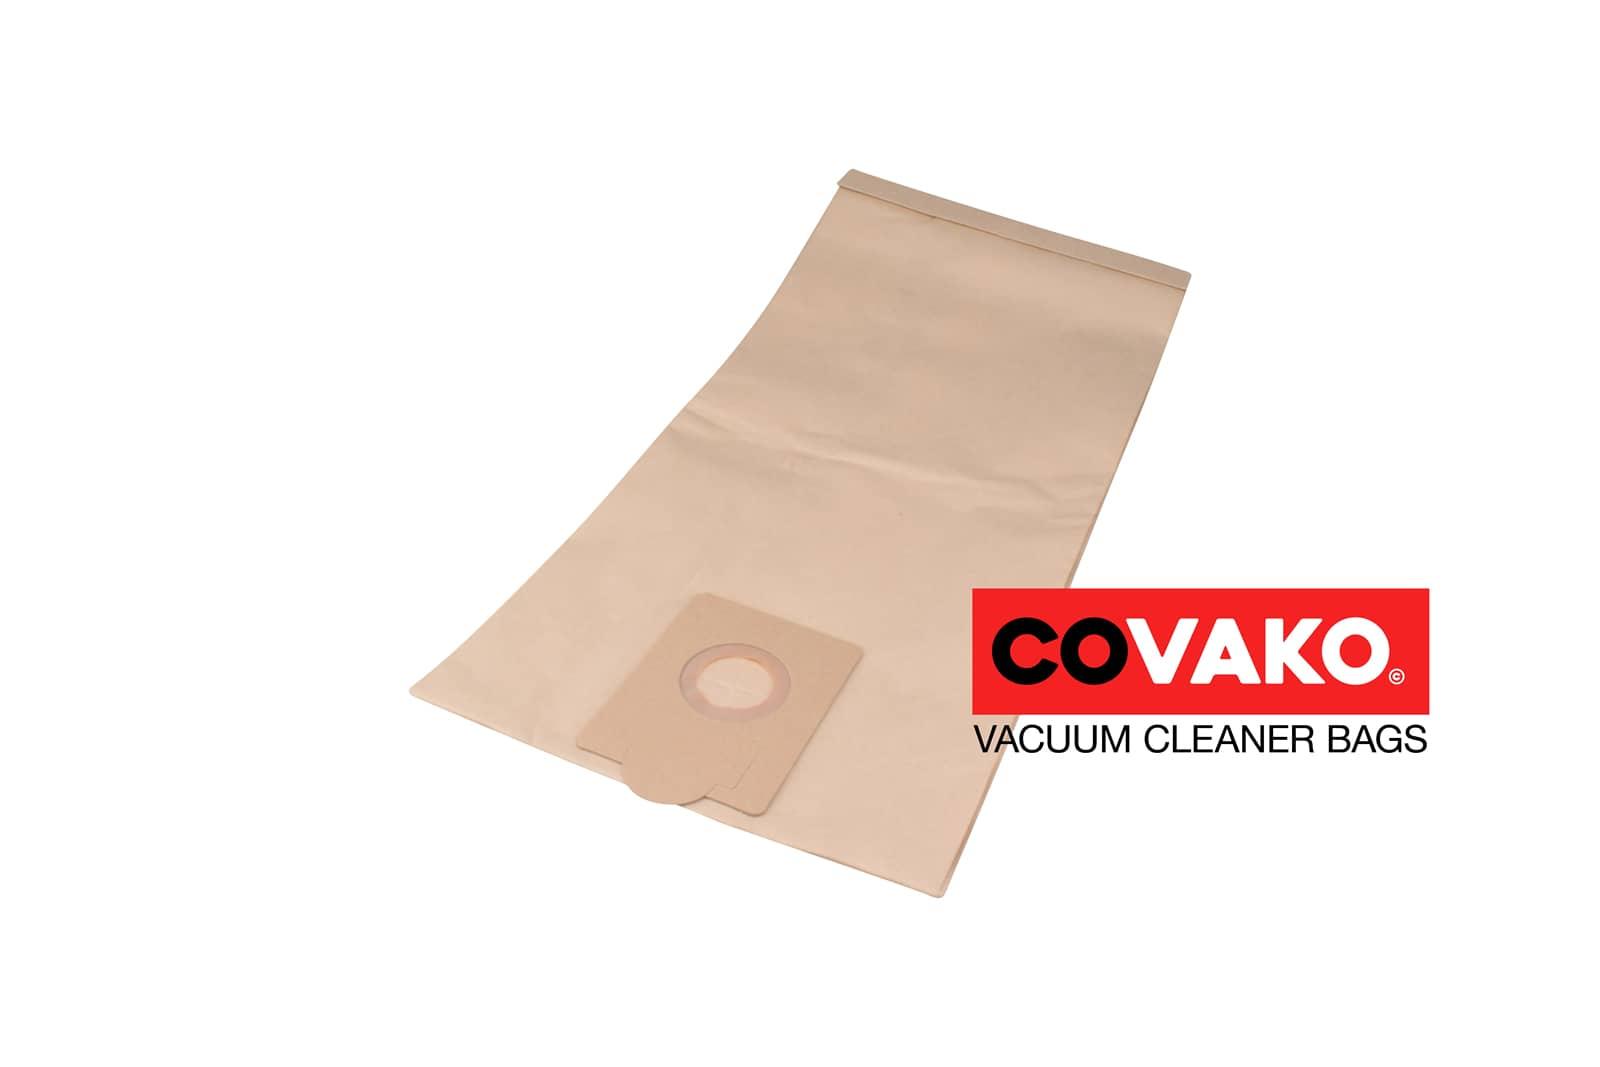 Fast K103200943 / Paper - Fast vacuum cleaner bags